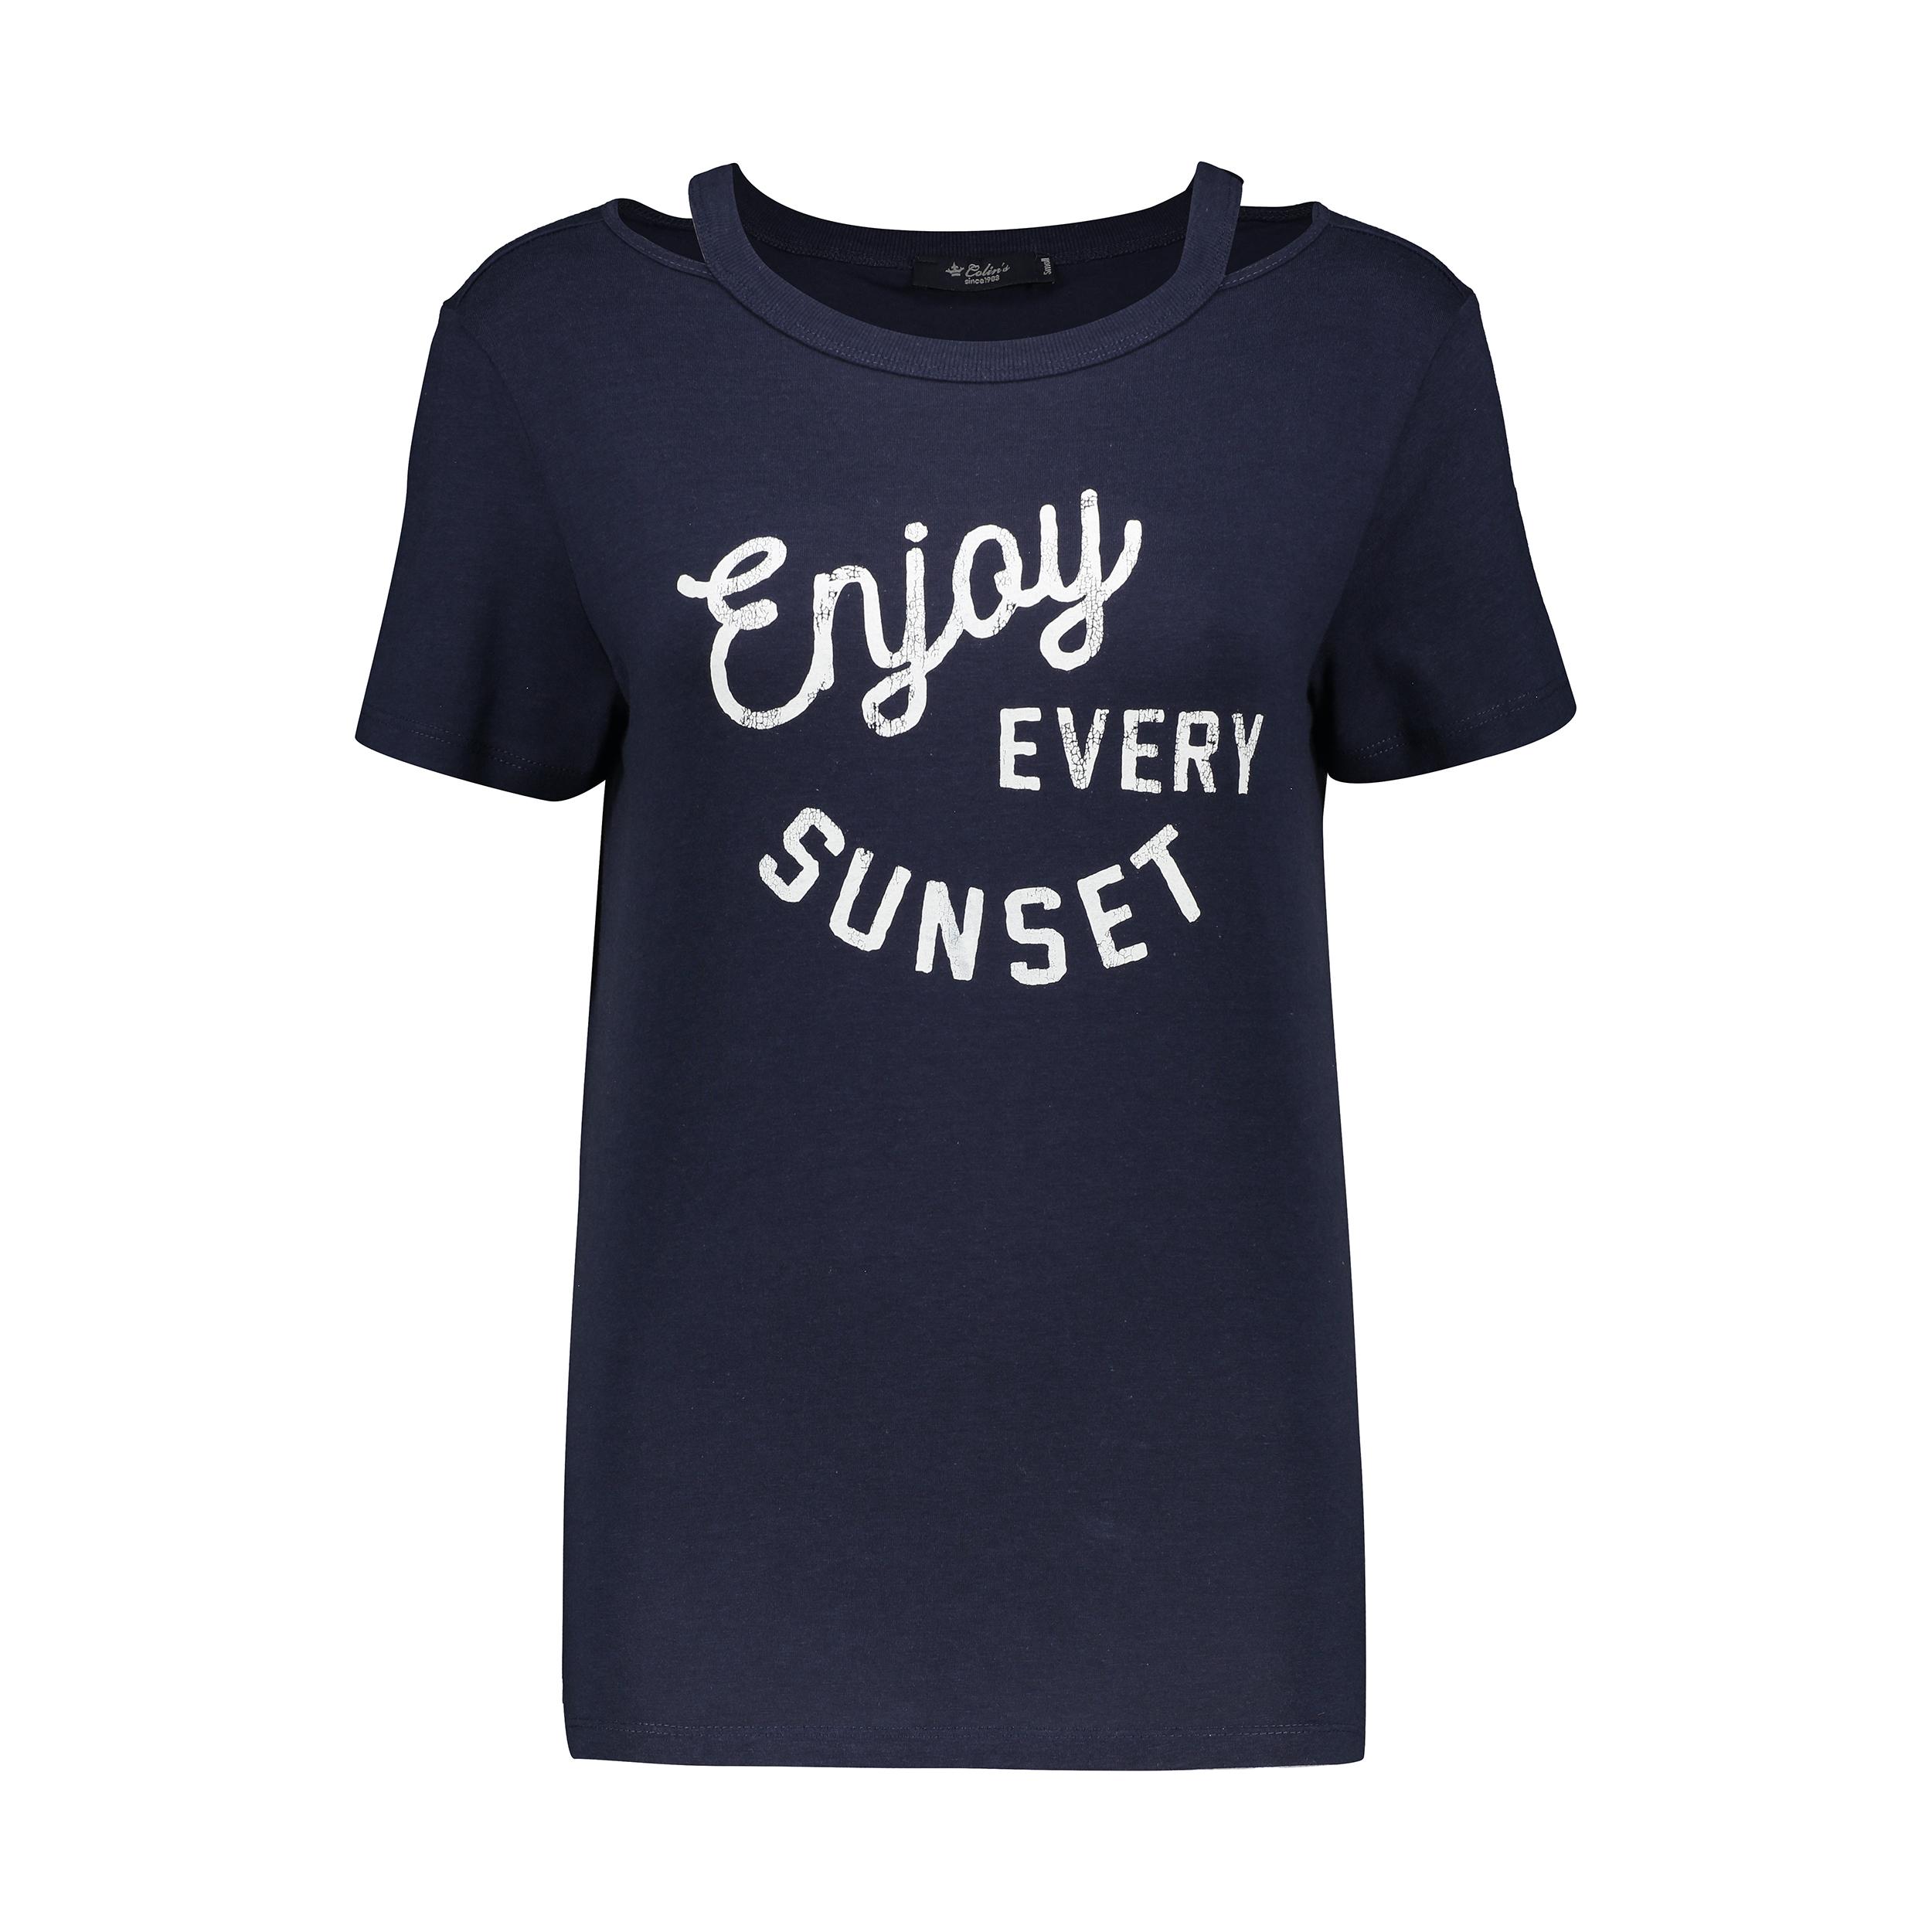 تی شرت زنانه کالینز مدل CL1032829-NAV thumb